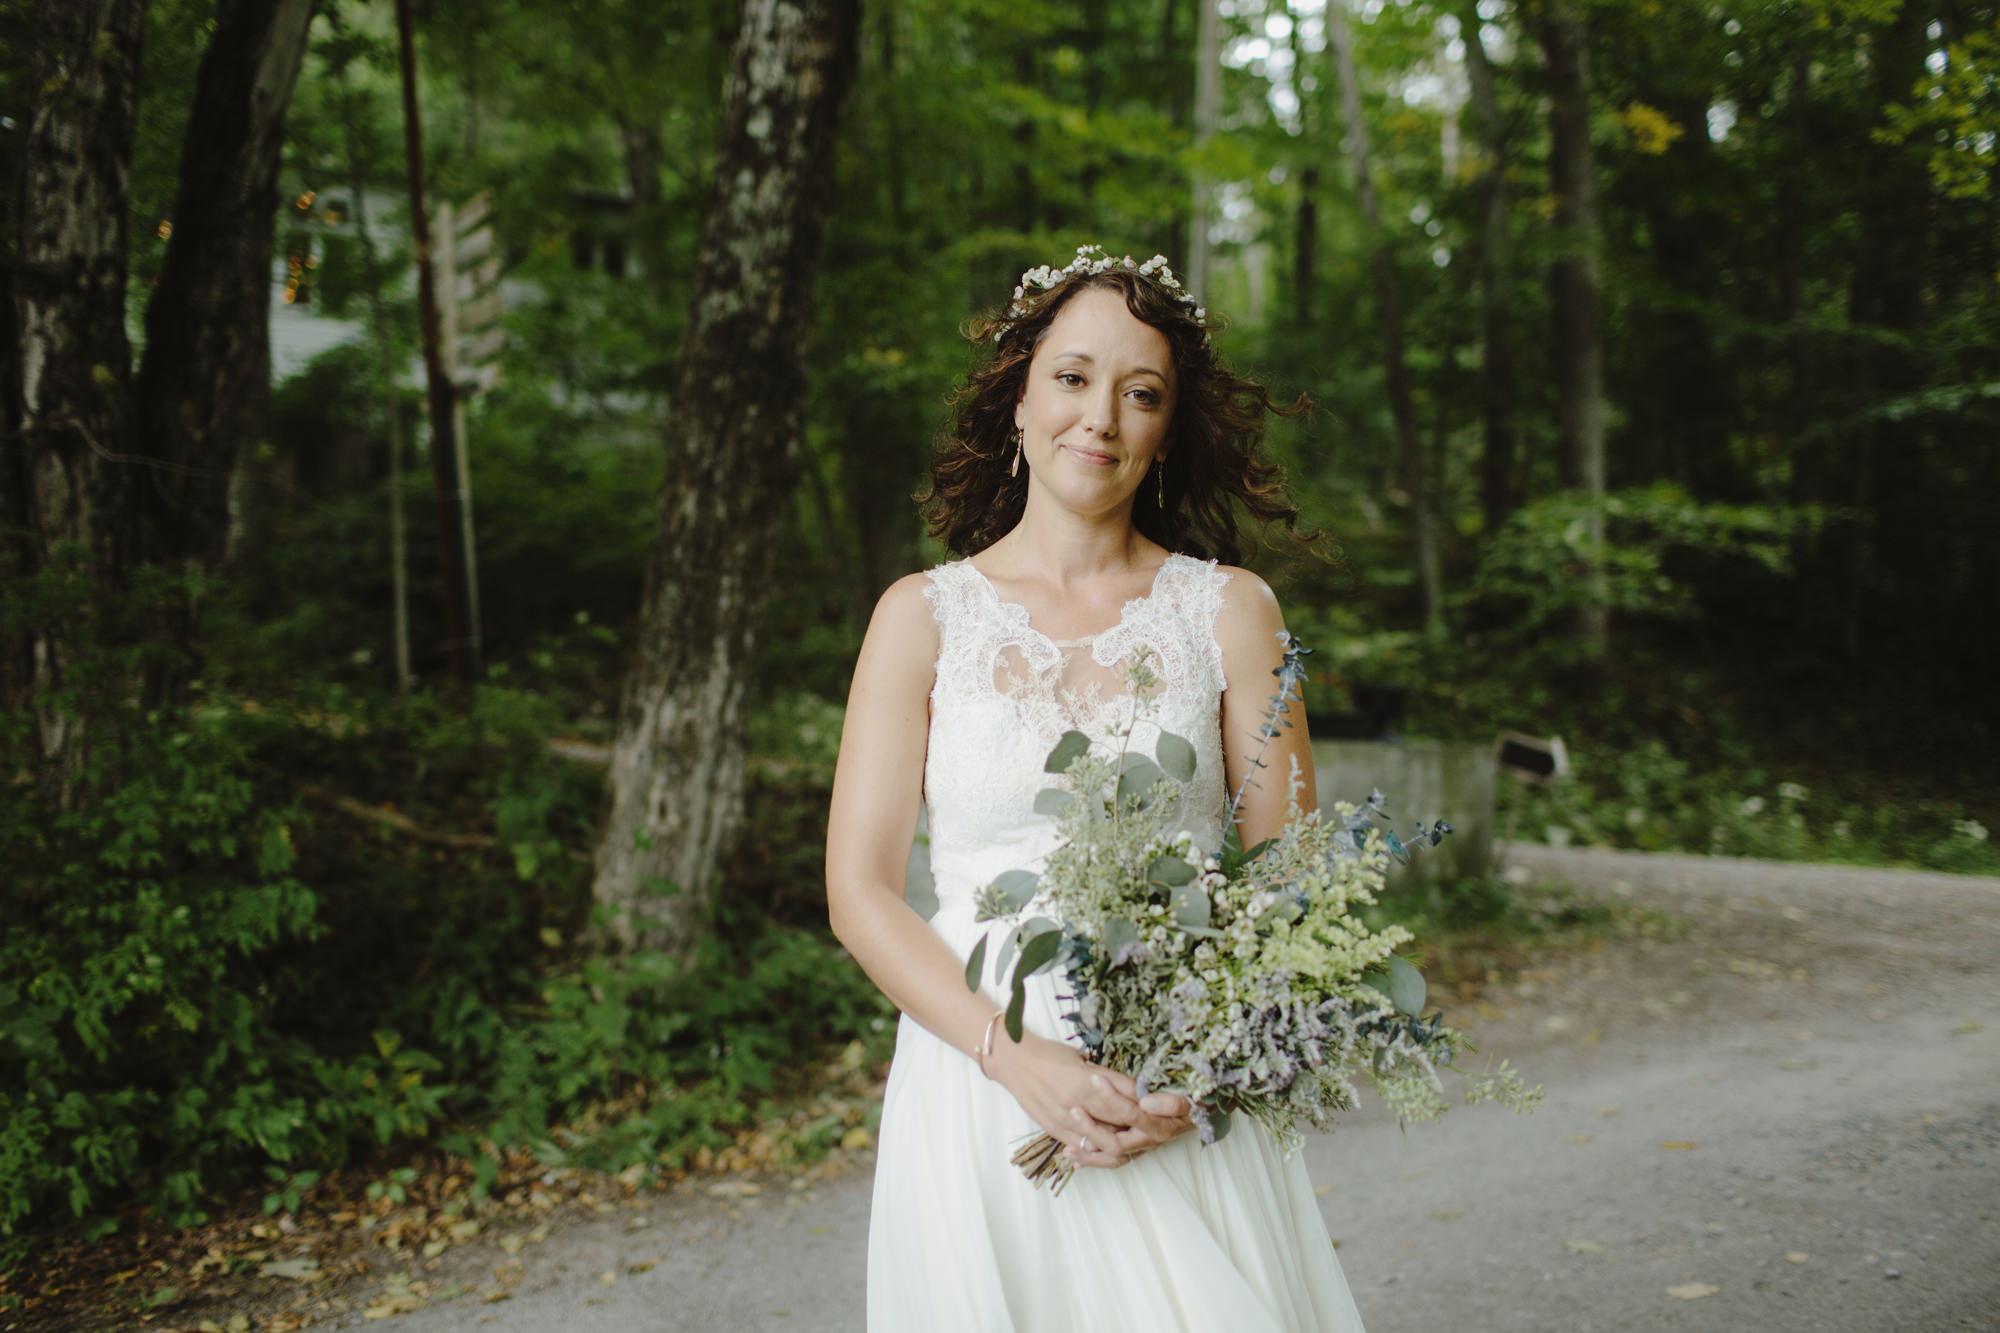 catskills_big_indian_springs_upstate_NY_wedding_sammblake038.jpg